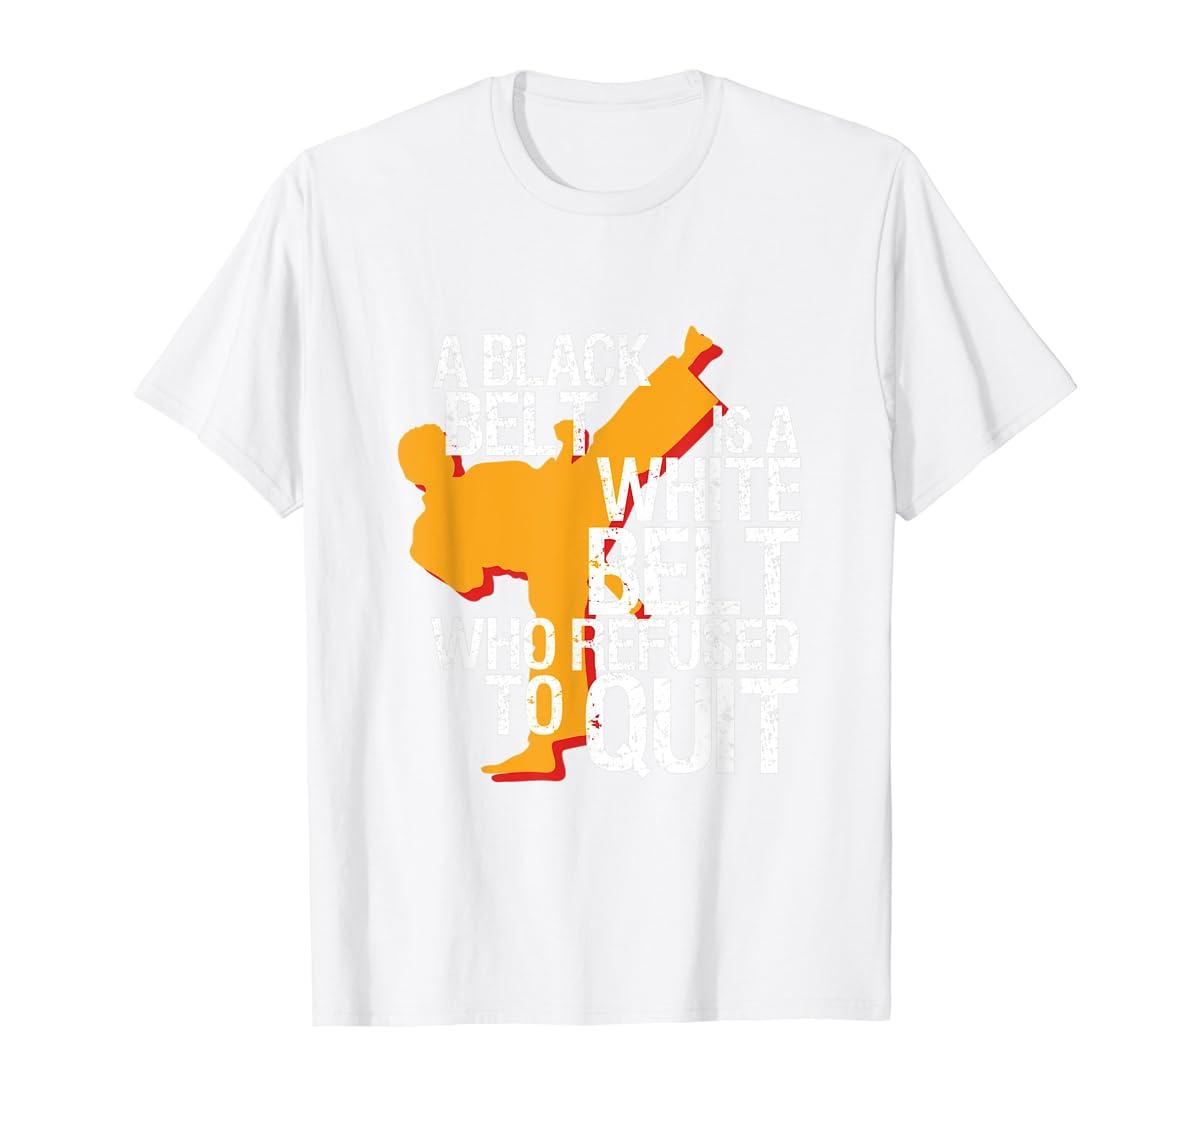 Taekwondo and Karate Black Belt Martial Art Student T-shirt-Men's T-Shirt-White